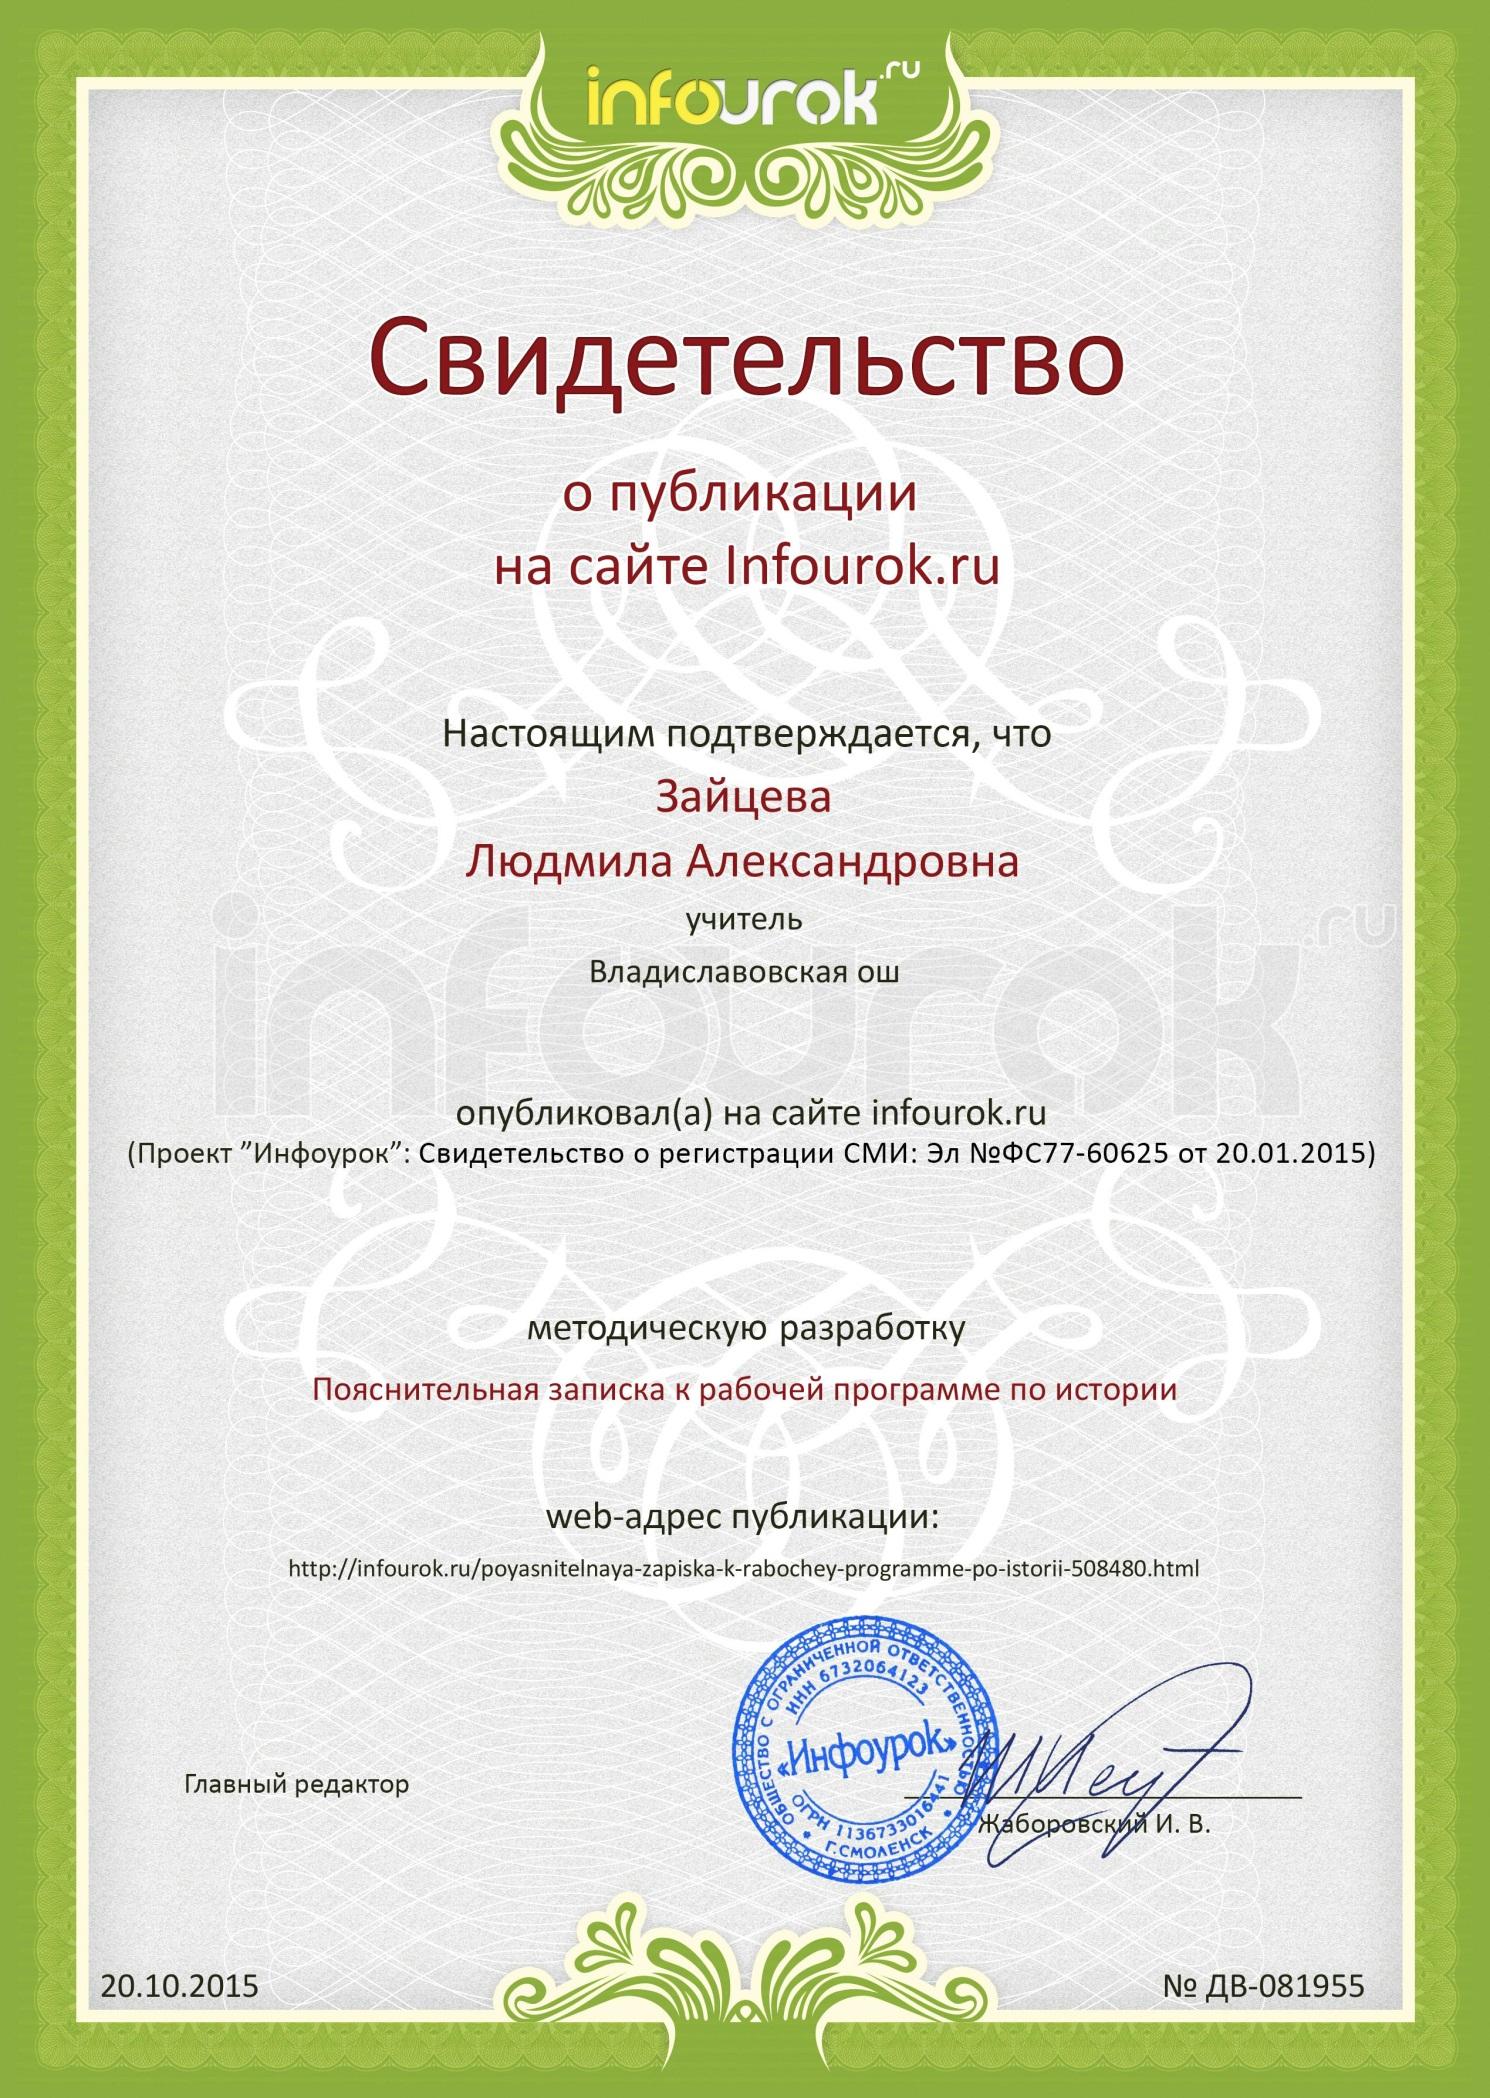 D:\МАМА\паспорта русские\аттестация\Сертификат проекта Infourok.ru № ДВ-081955.jpg